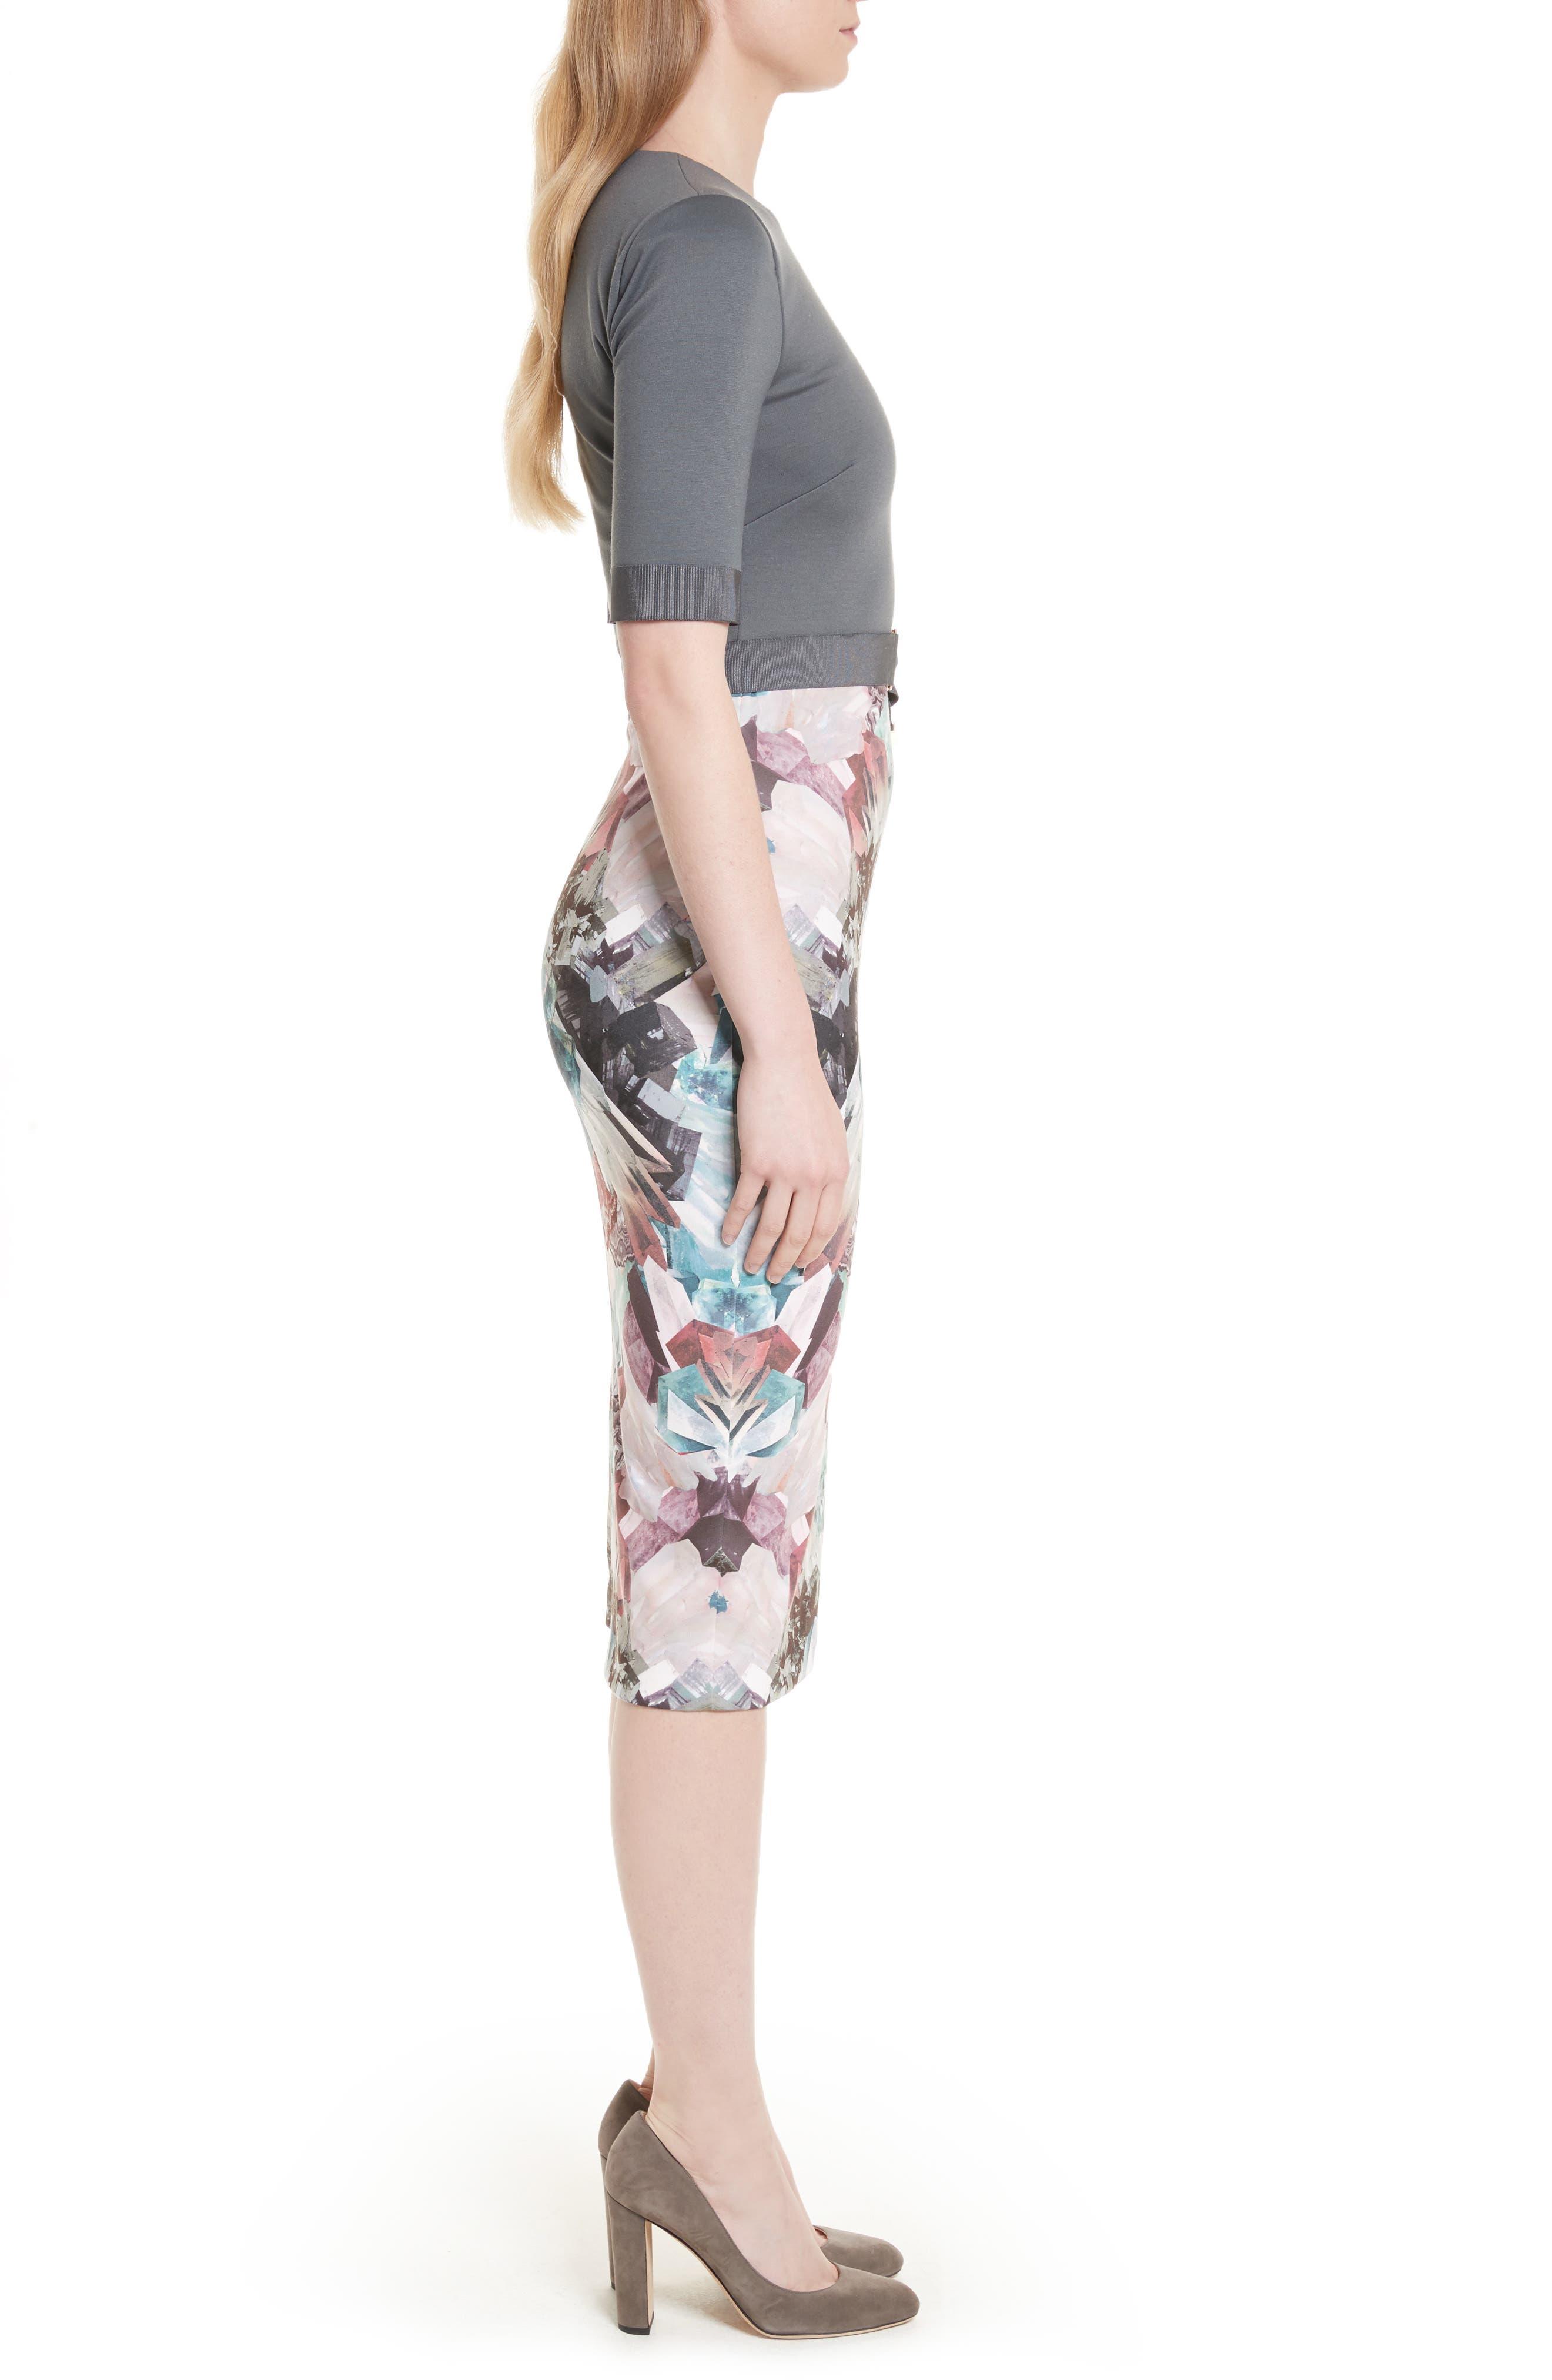 Anaste Mirror Minerals Print Dress,                             Alternate thumbnail 3, color,                             021